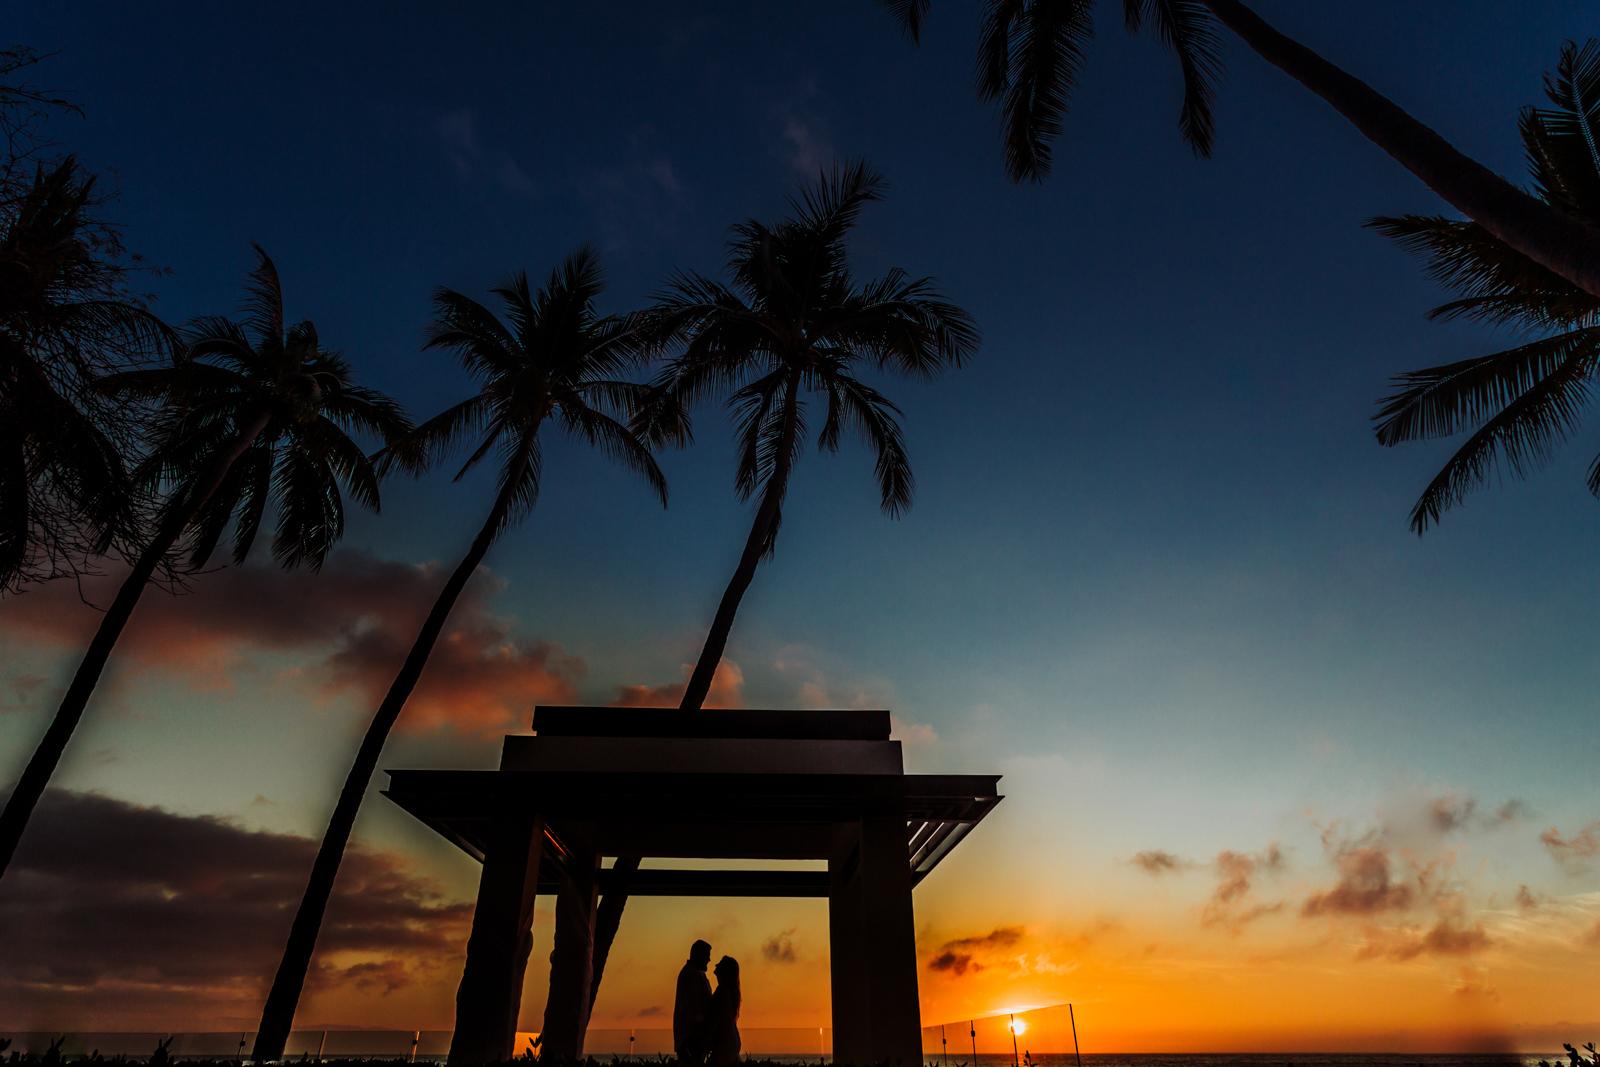 wedding-siluette-bride-groom-sunset-ocean-vallarta-beach-palms-sky-clouds